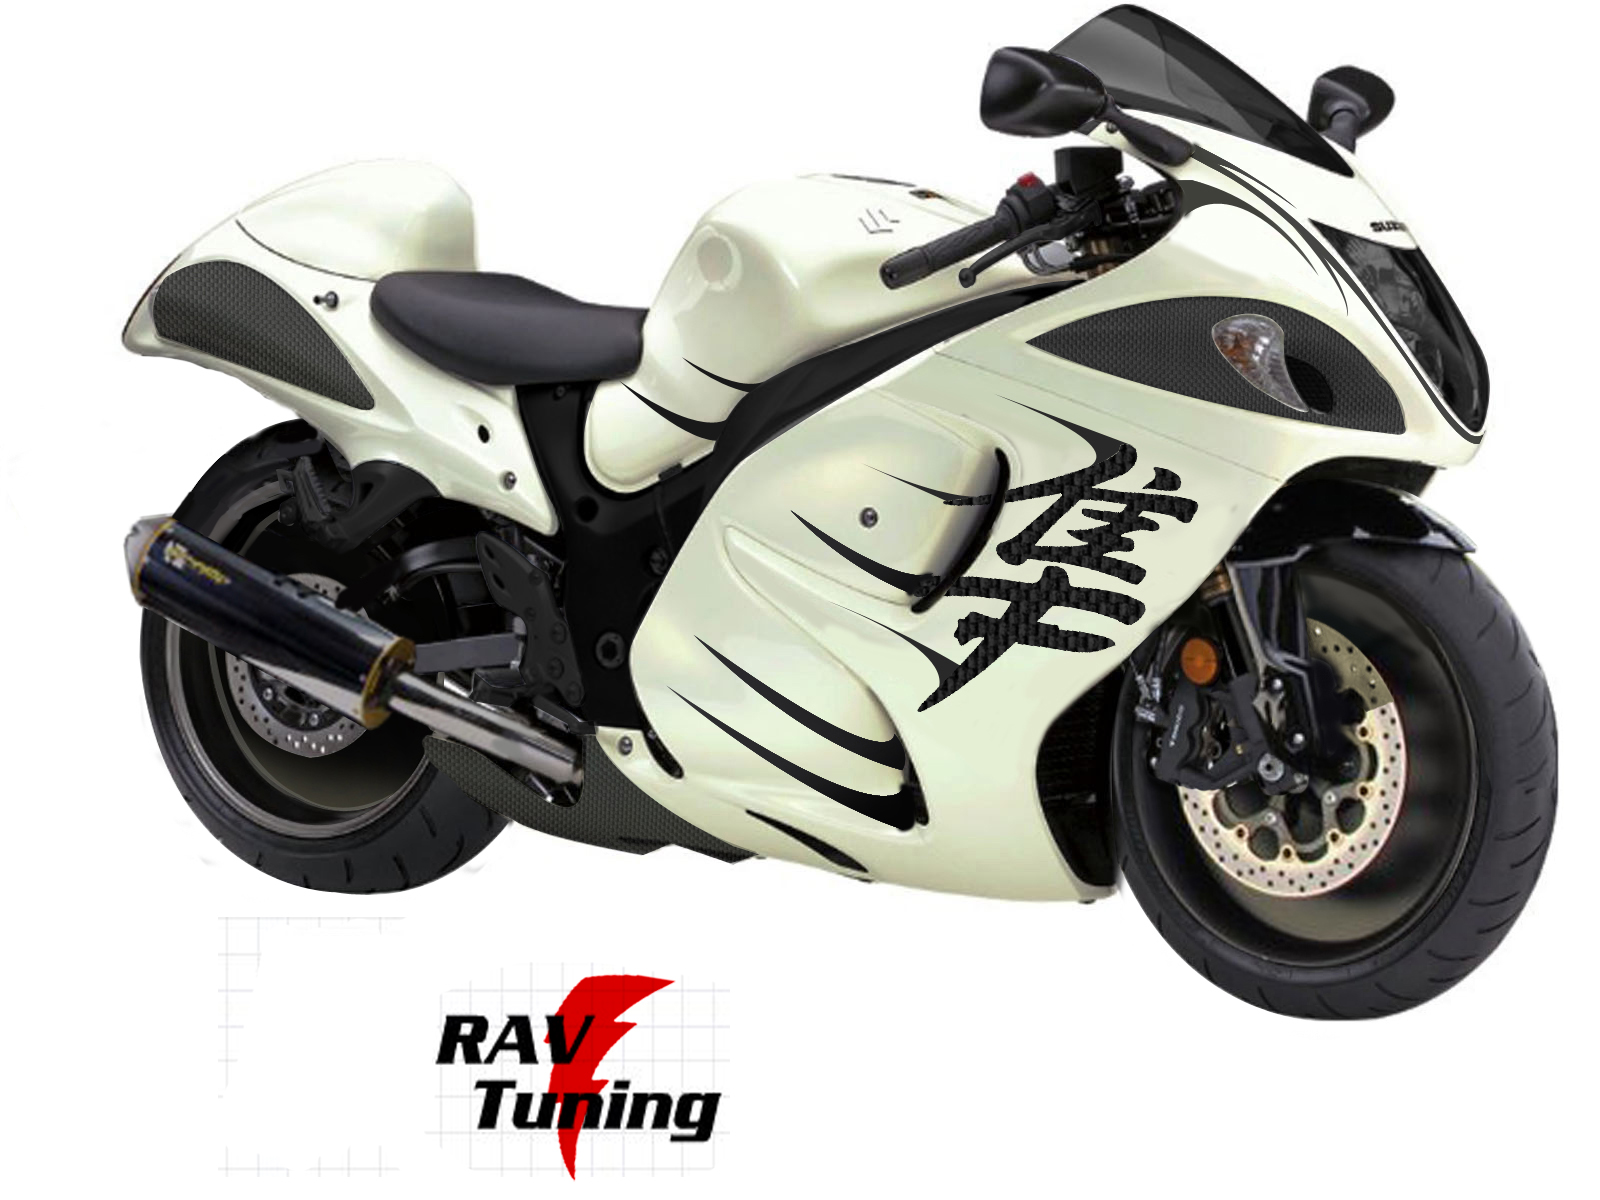 hayabusa tuning motorbikes 2560 - photo #38